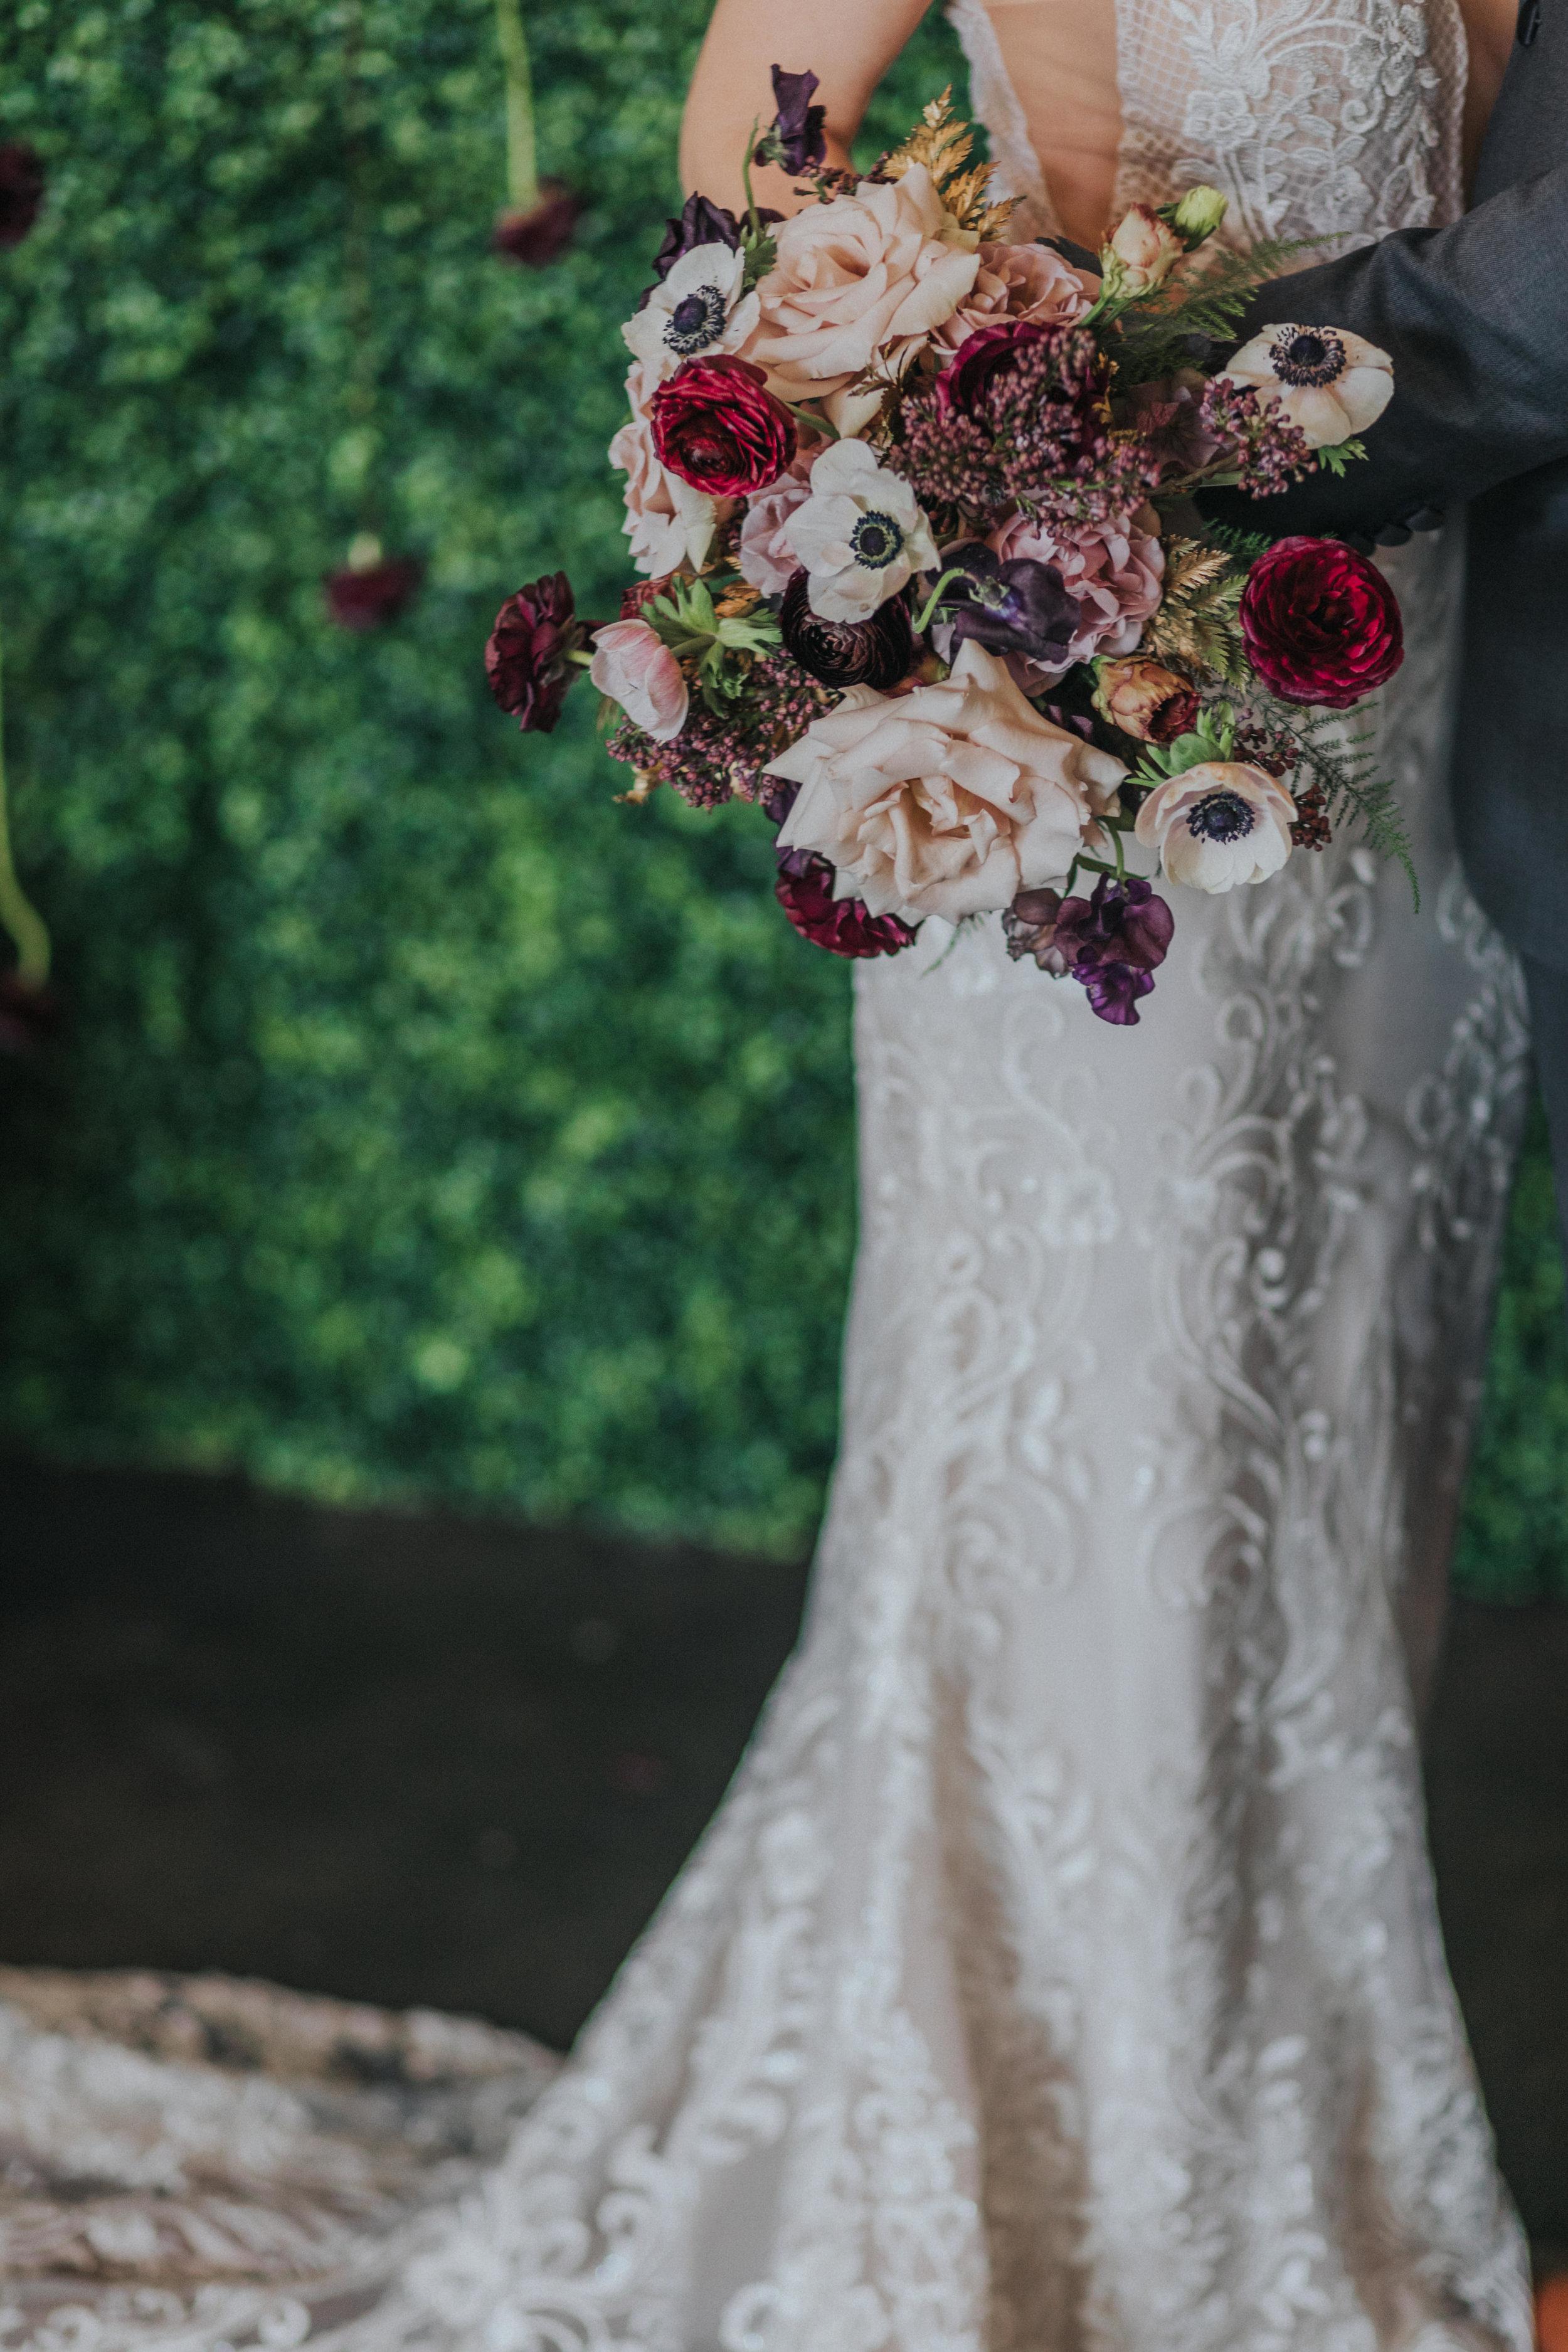 121 tiny-luxe-weddings-omaha-nebraska-midwest-empire-room.jpg